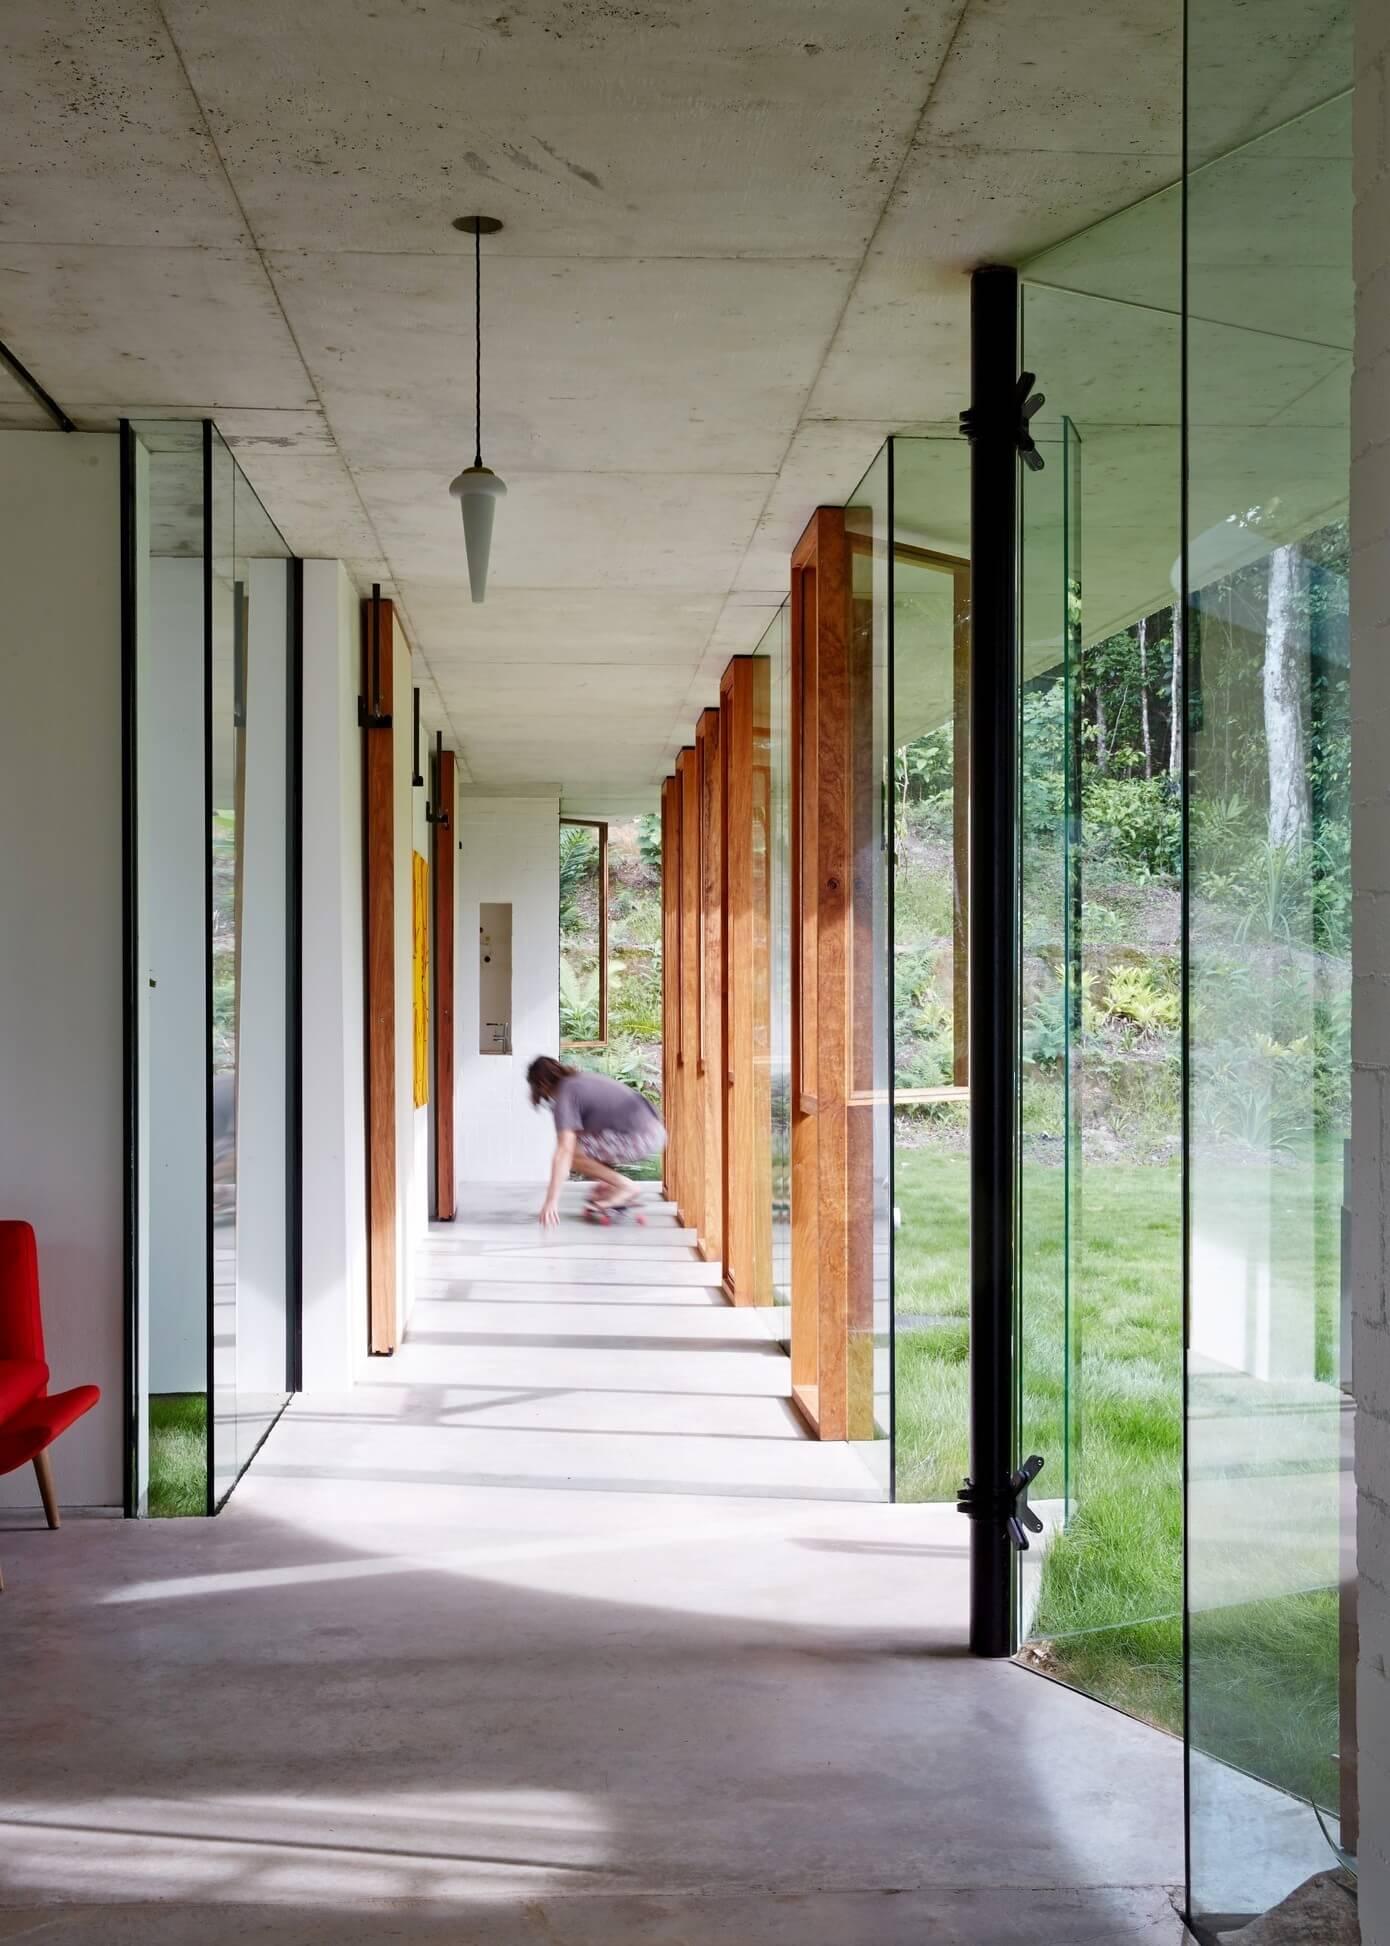 planchonella-house-jesse-bennett-architect-07